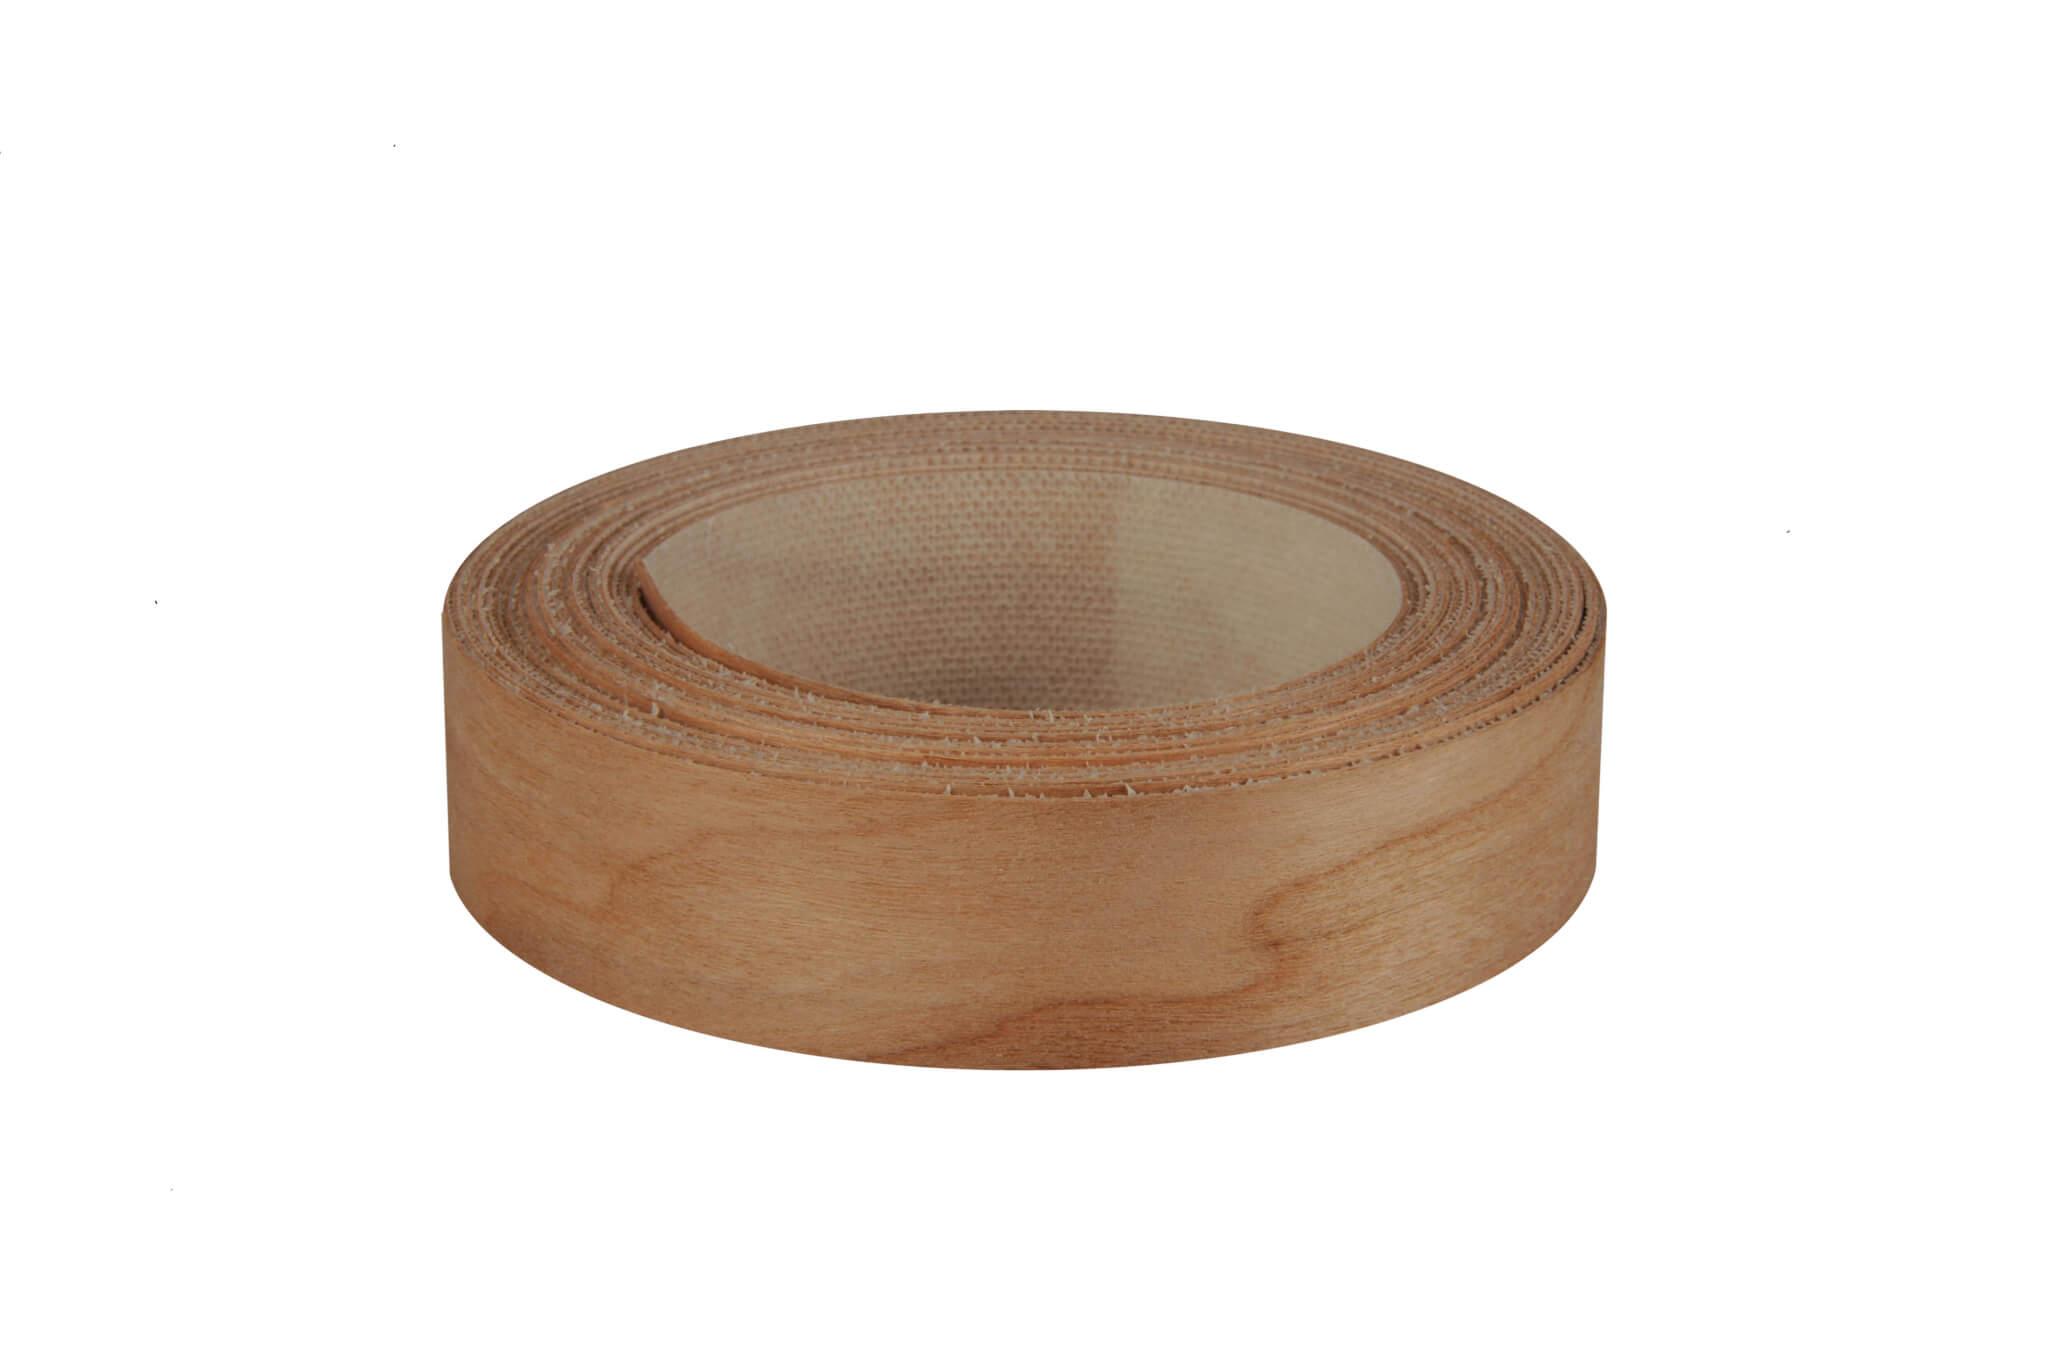 sptd bandes de chant en bois v ritable adh sif ou thermocollant. Black Bedroom Furniture Sets. Home Design Ideas